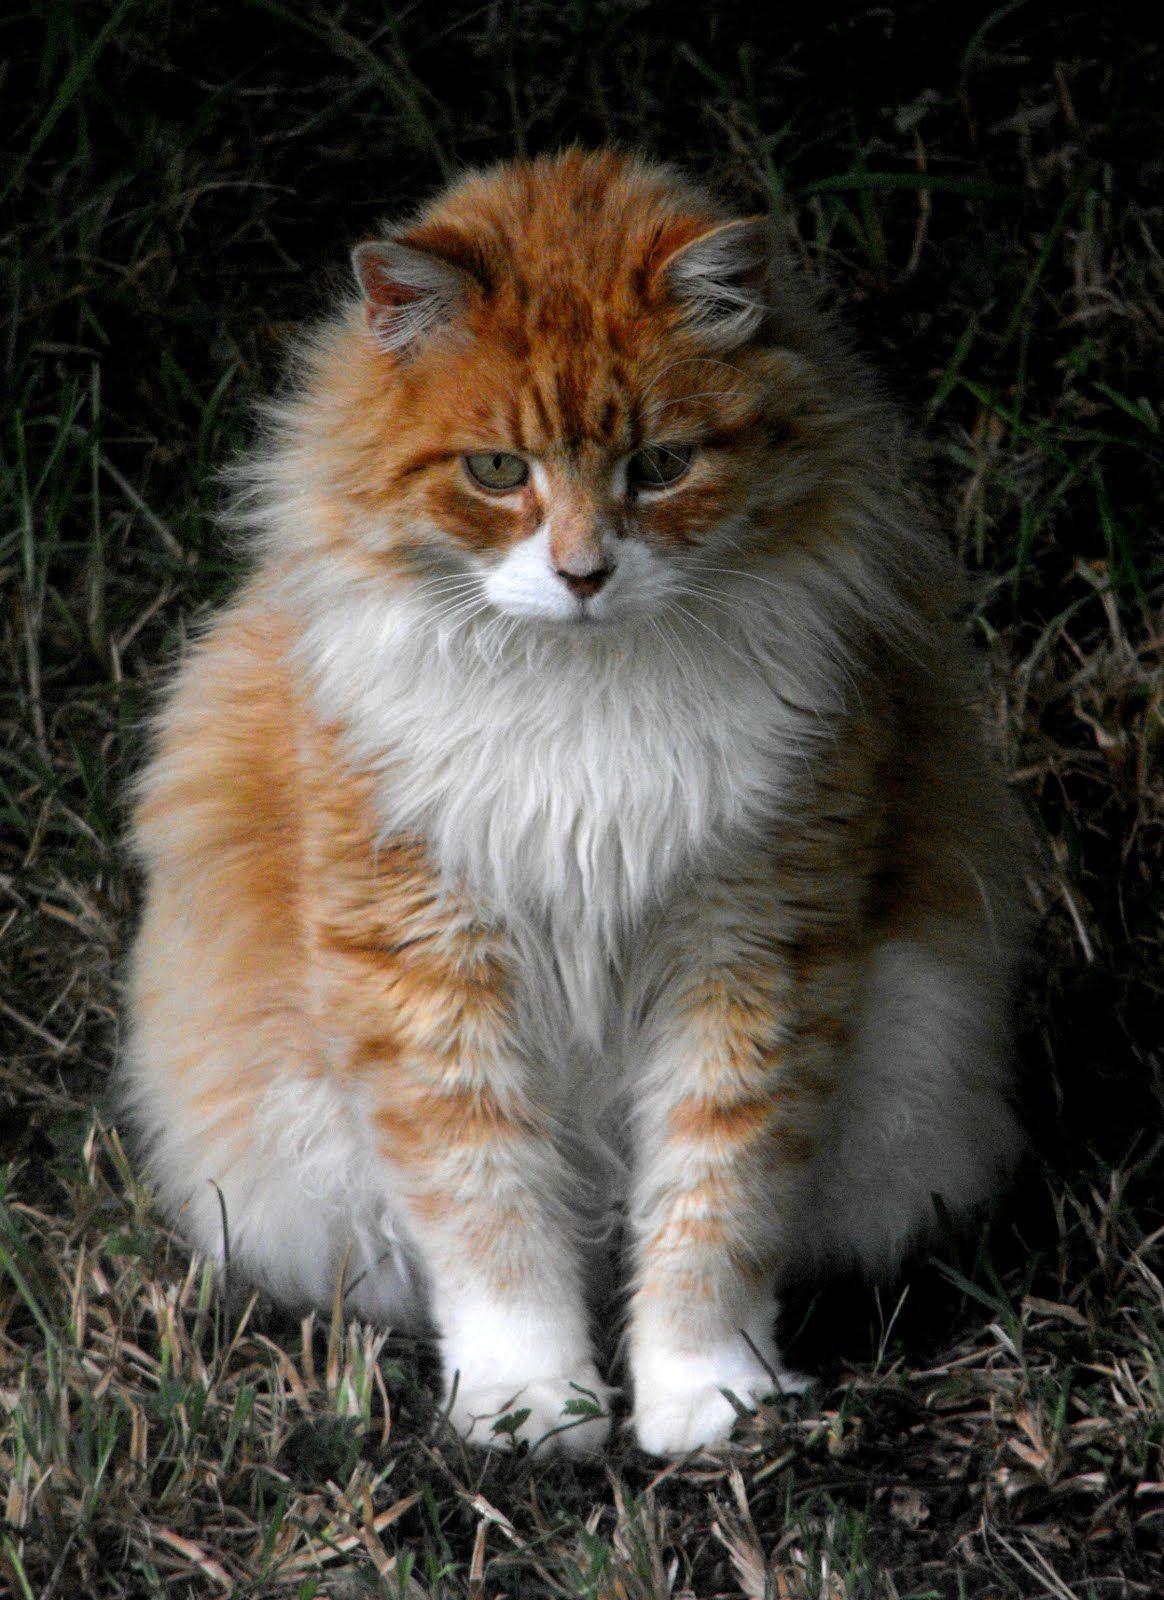 Ginger Orange White Long Hair Cat Jpg Jpeg Image 1164 1600 Pixels Scaled 54 Cat Breeds Great Cat Types Of Cats